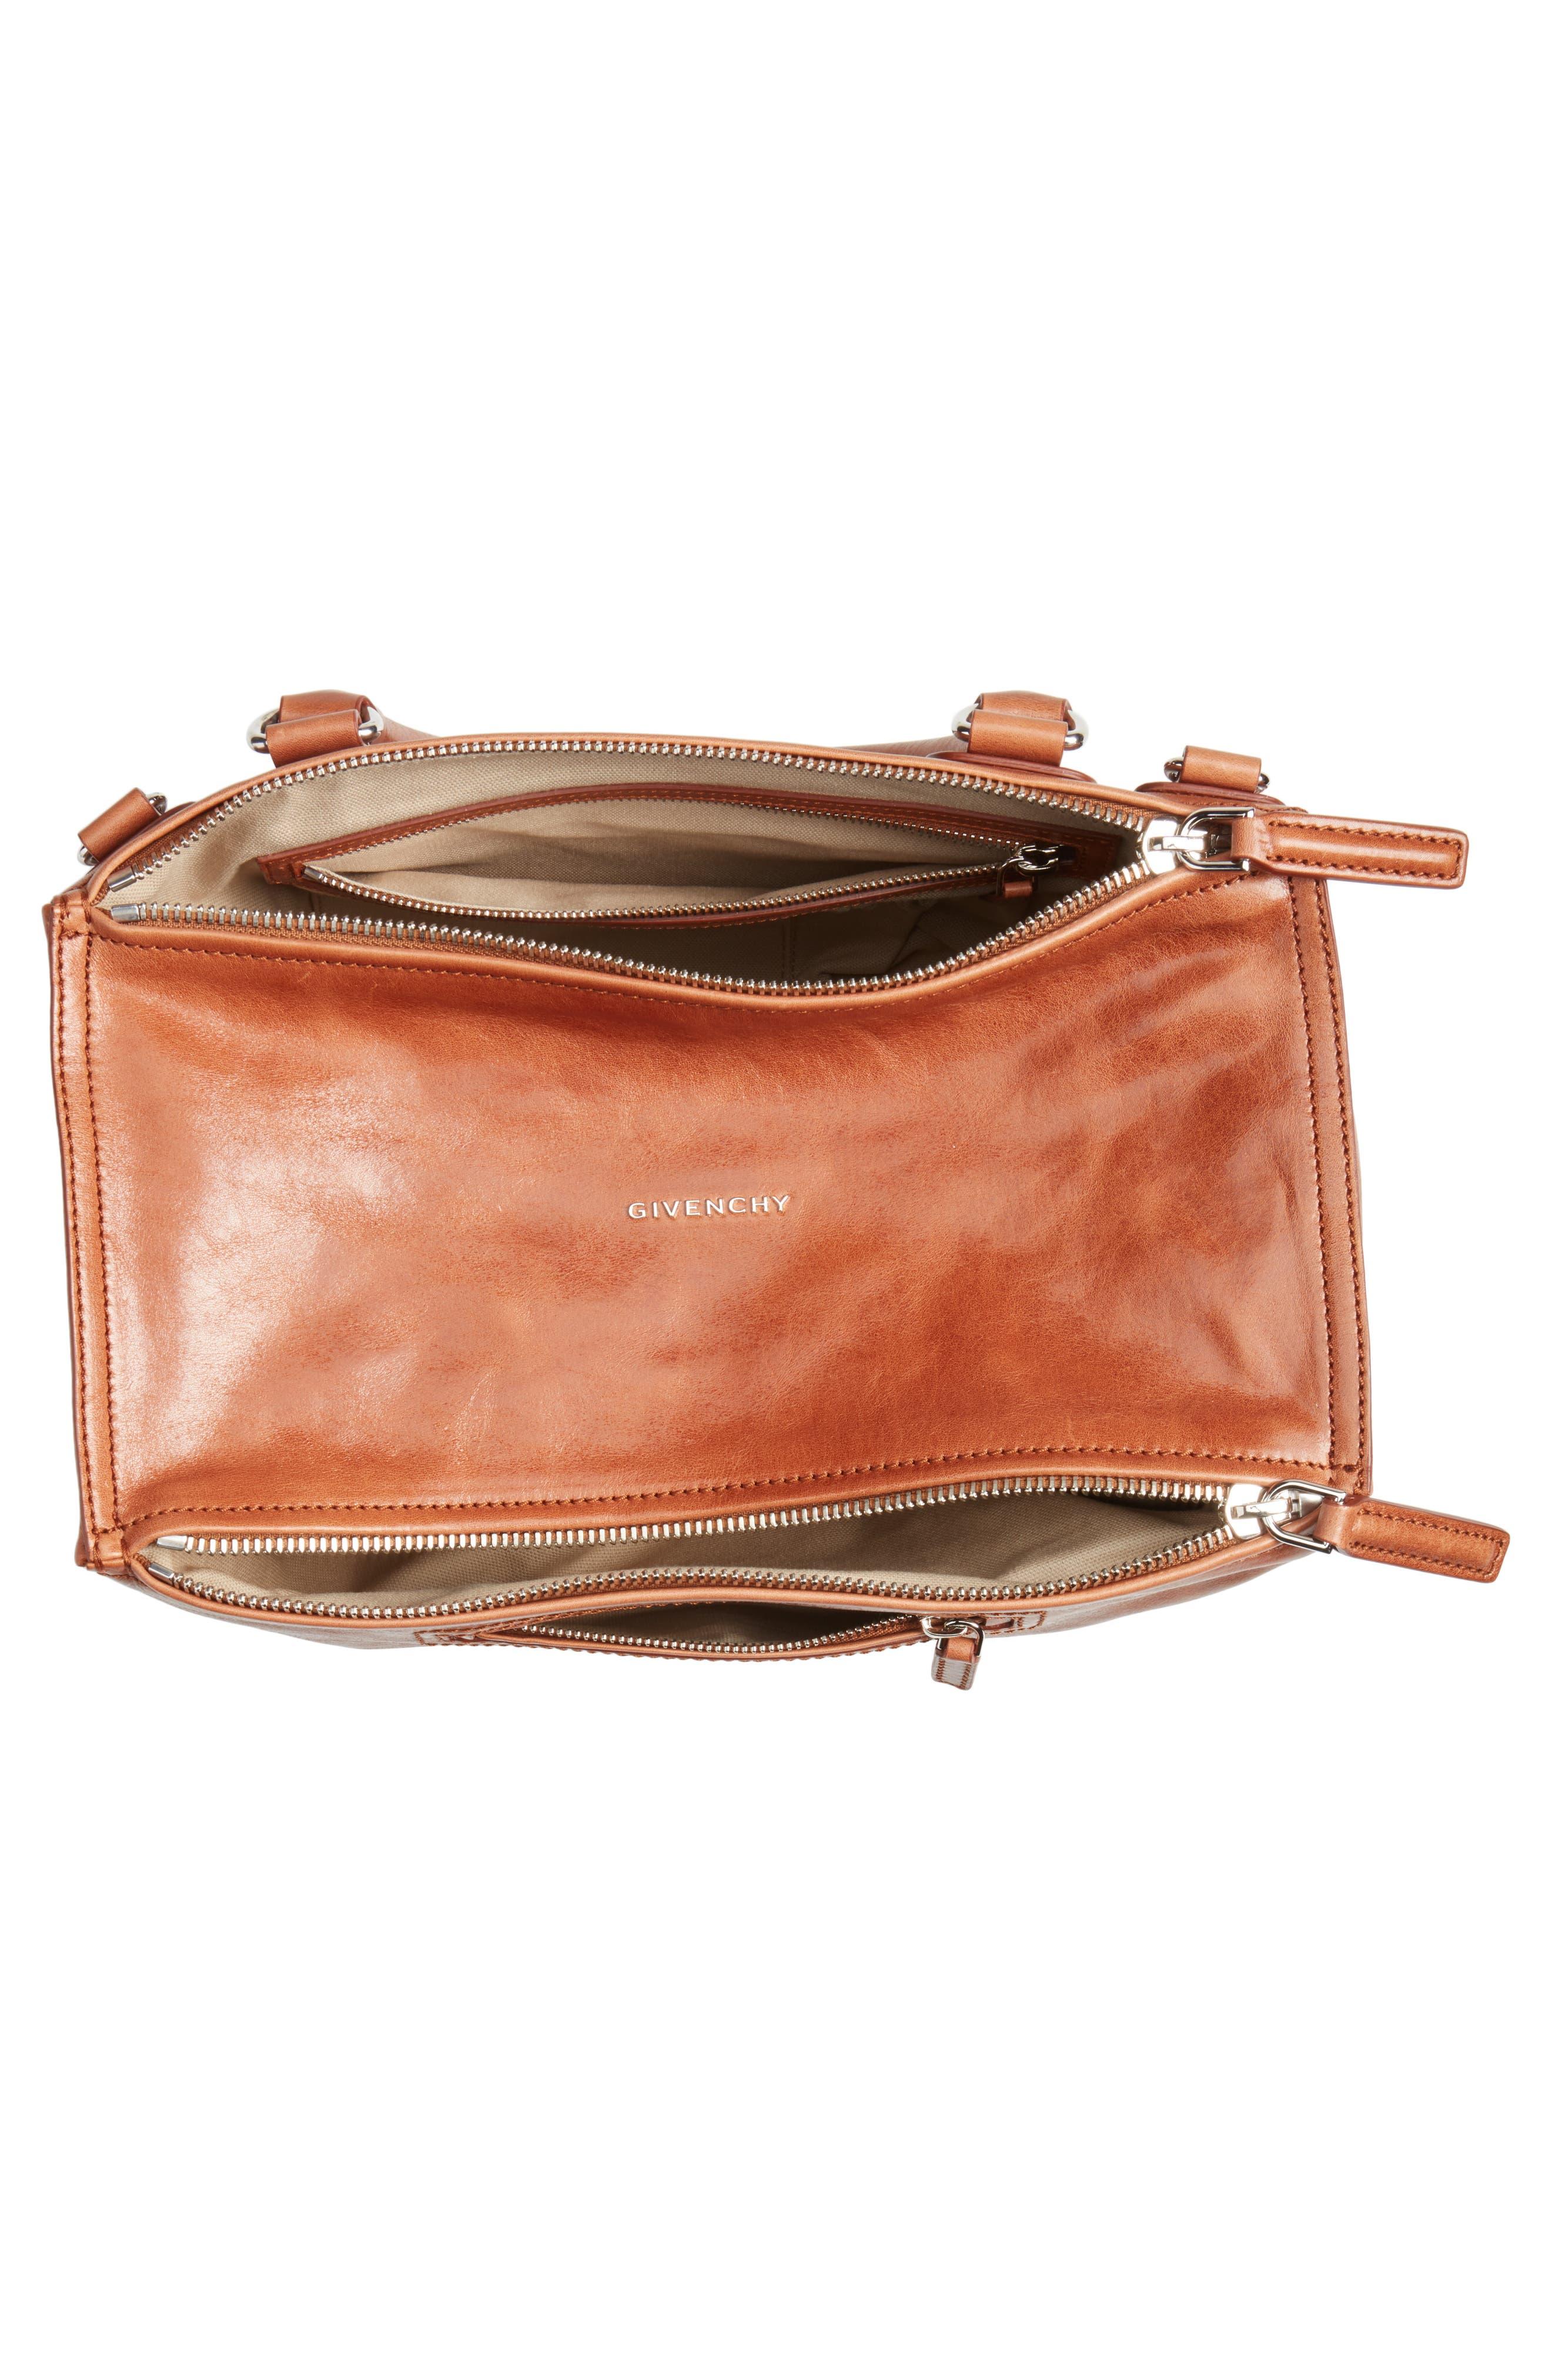 Medium Pandora Shiny Aged Leather Satchel,                             Alternate thumbnail 4, color,                             Cognac